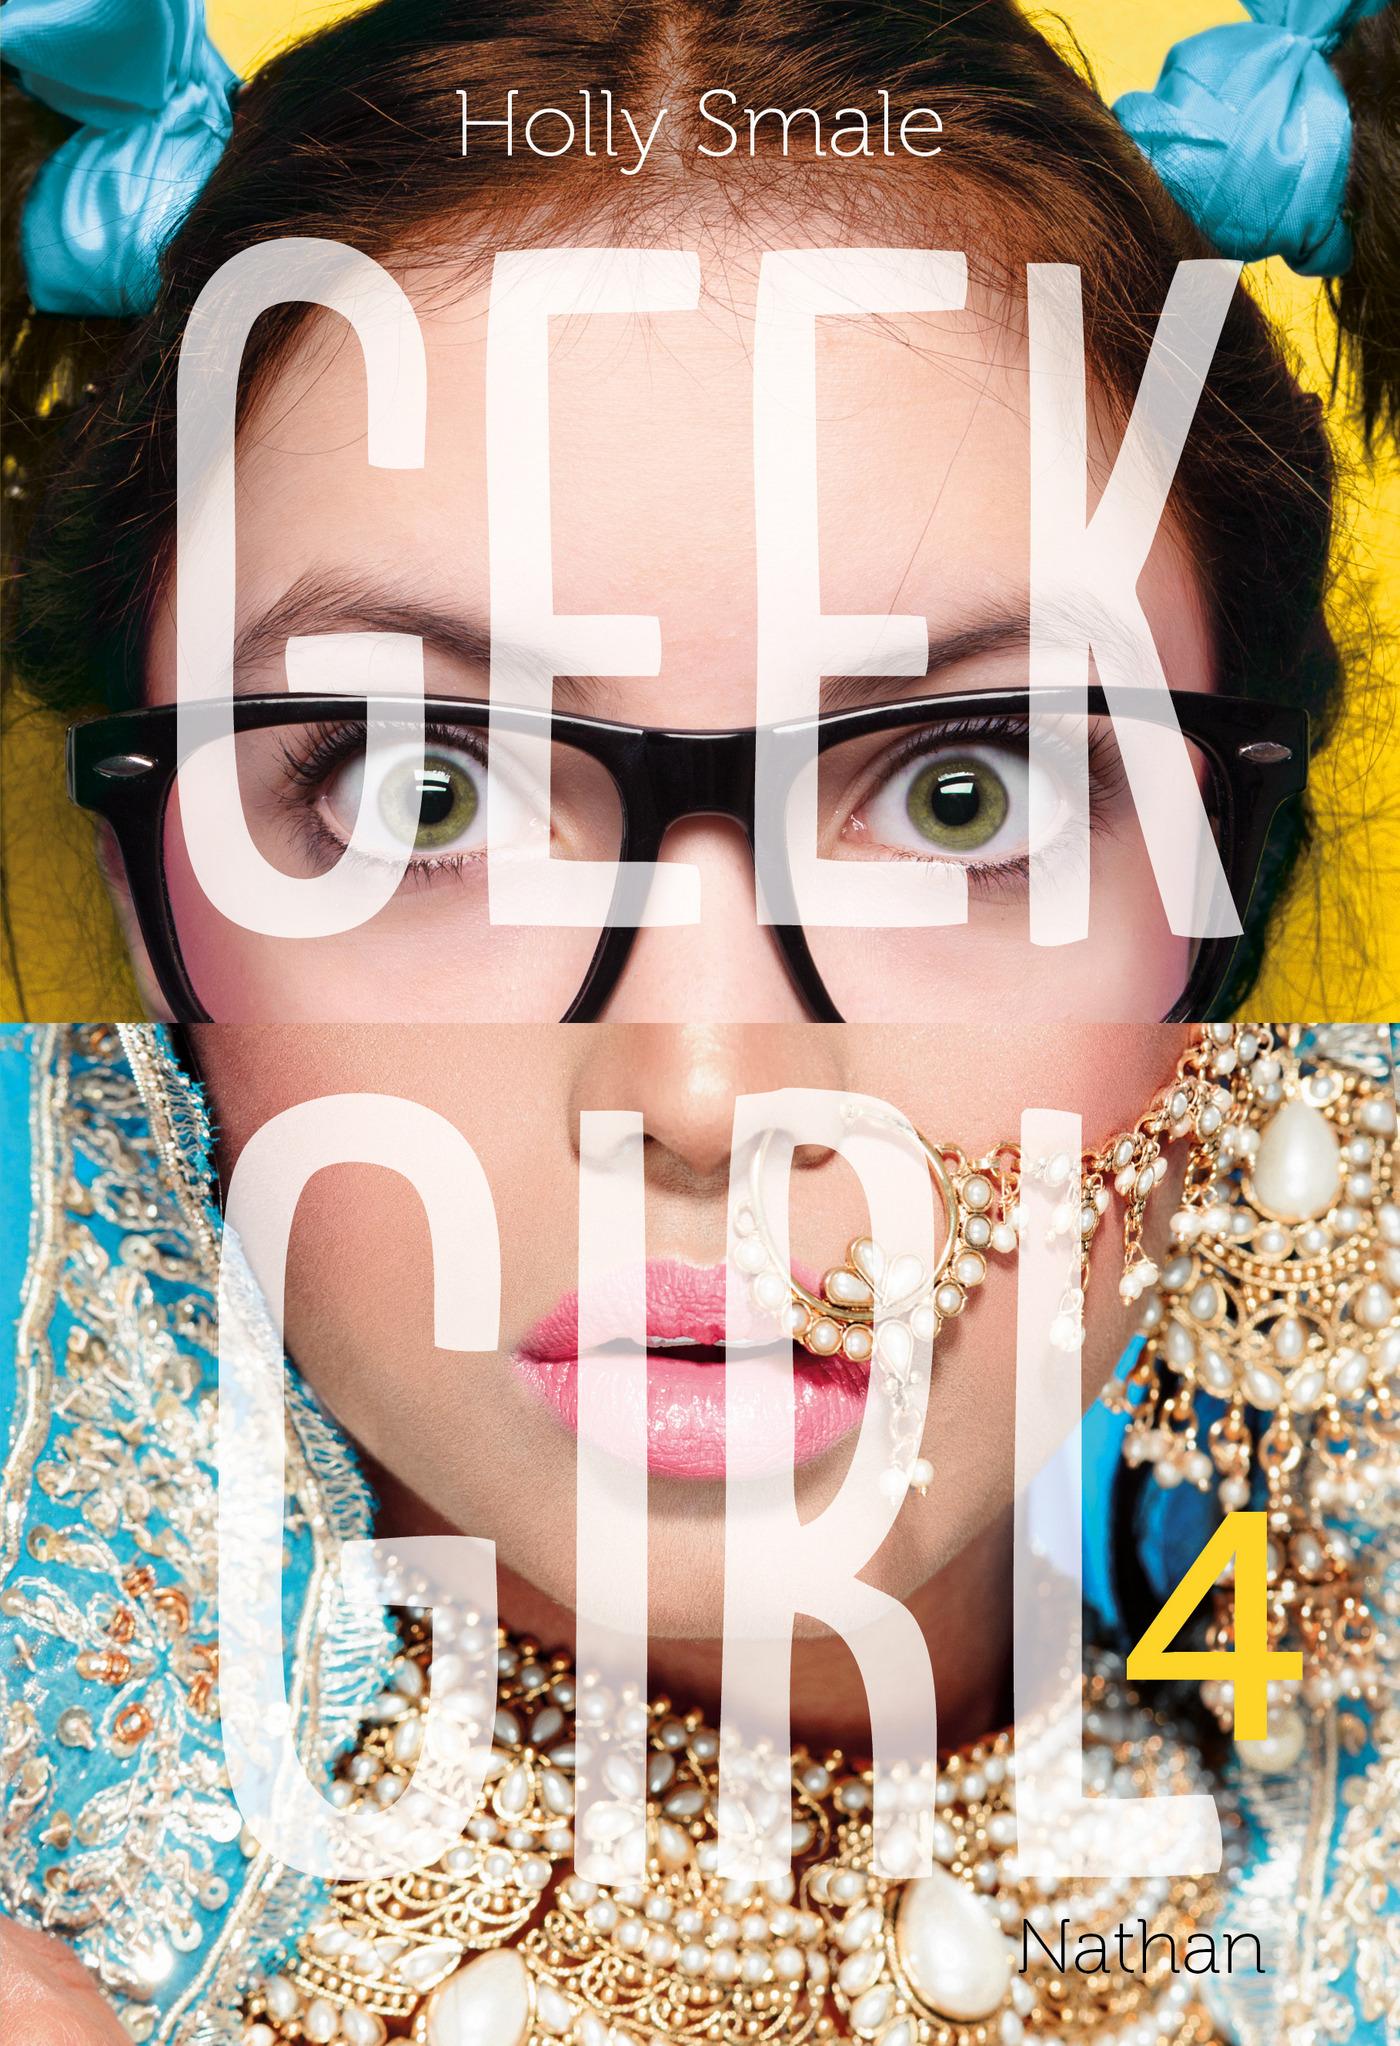 Geek girl - Tome 4 (ebook)